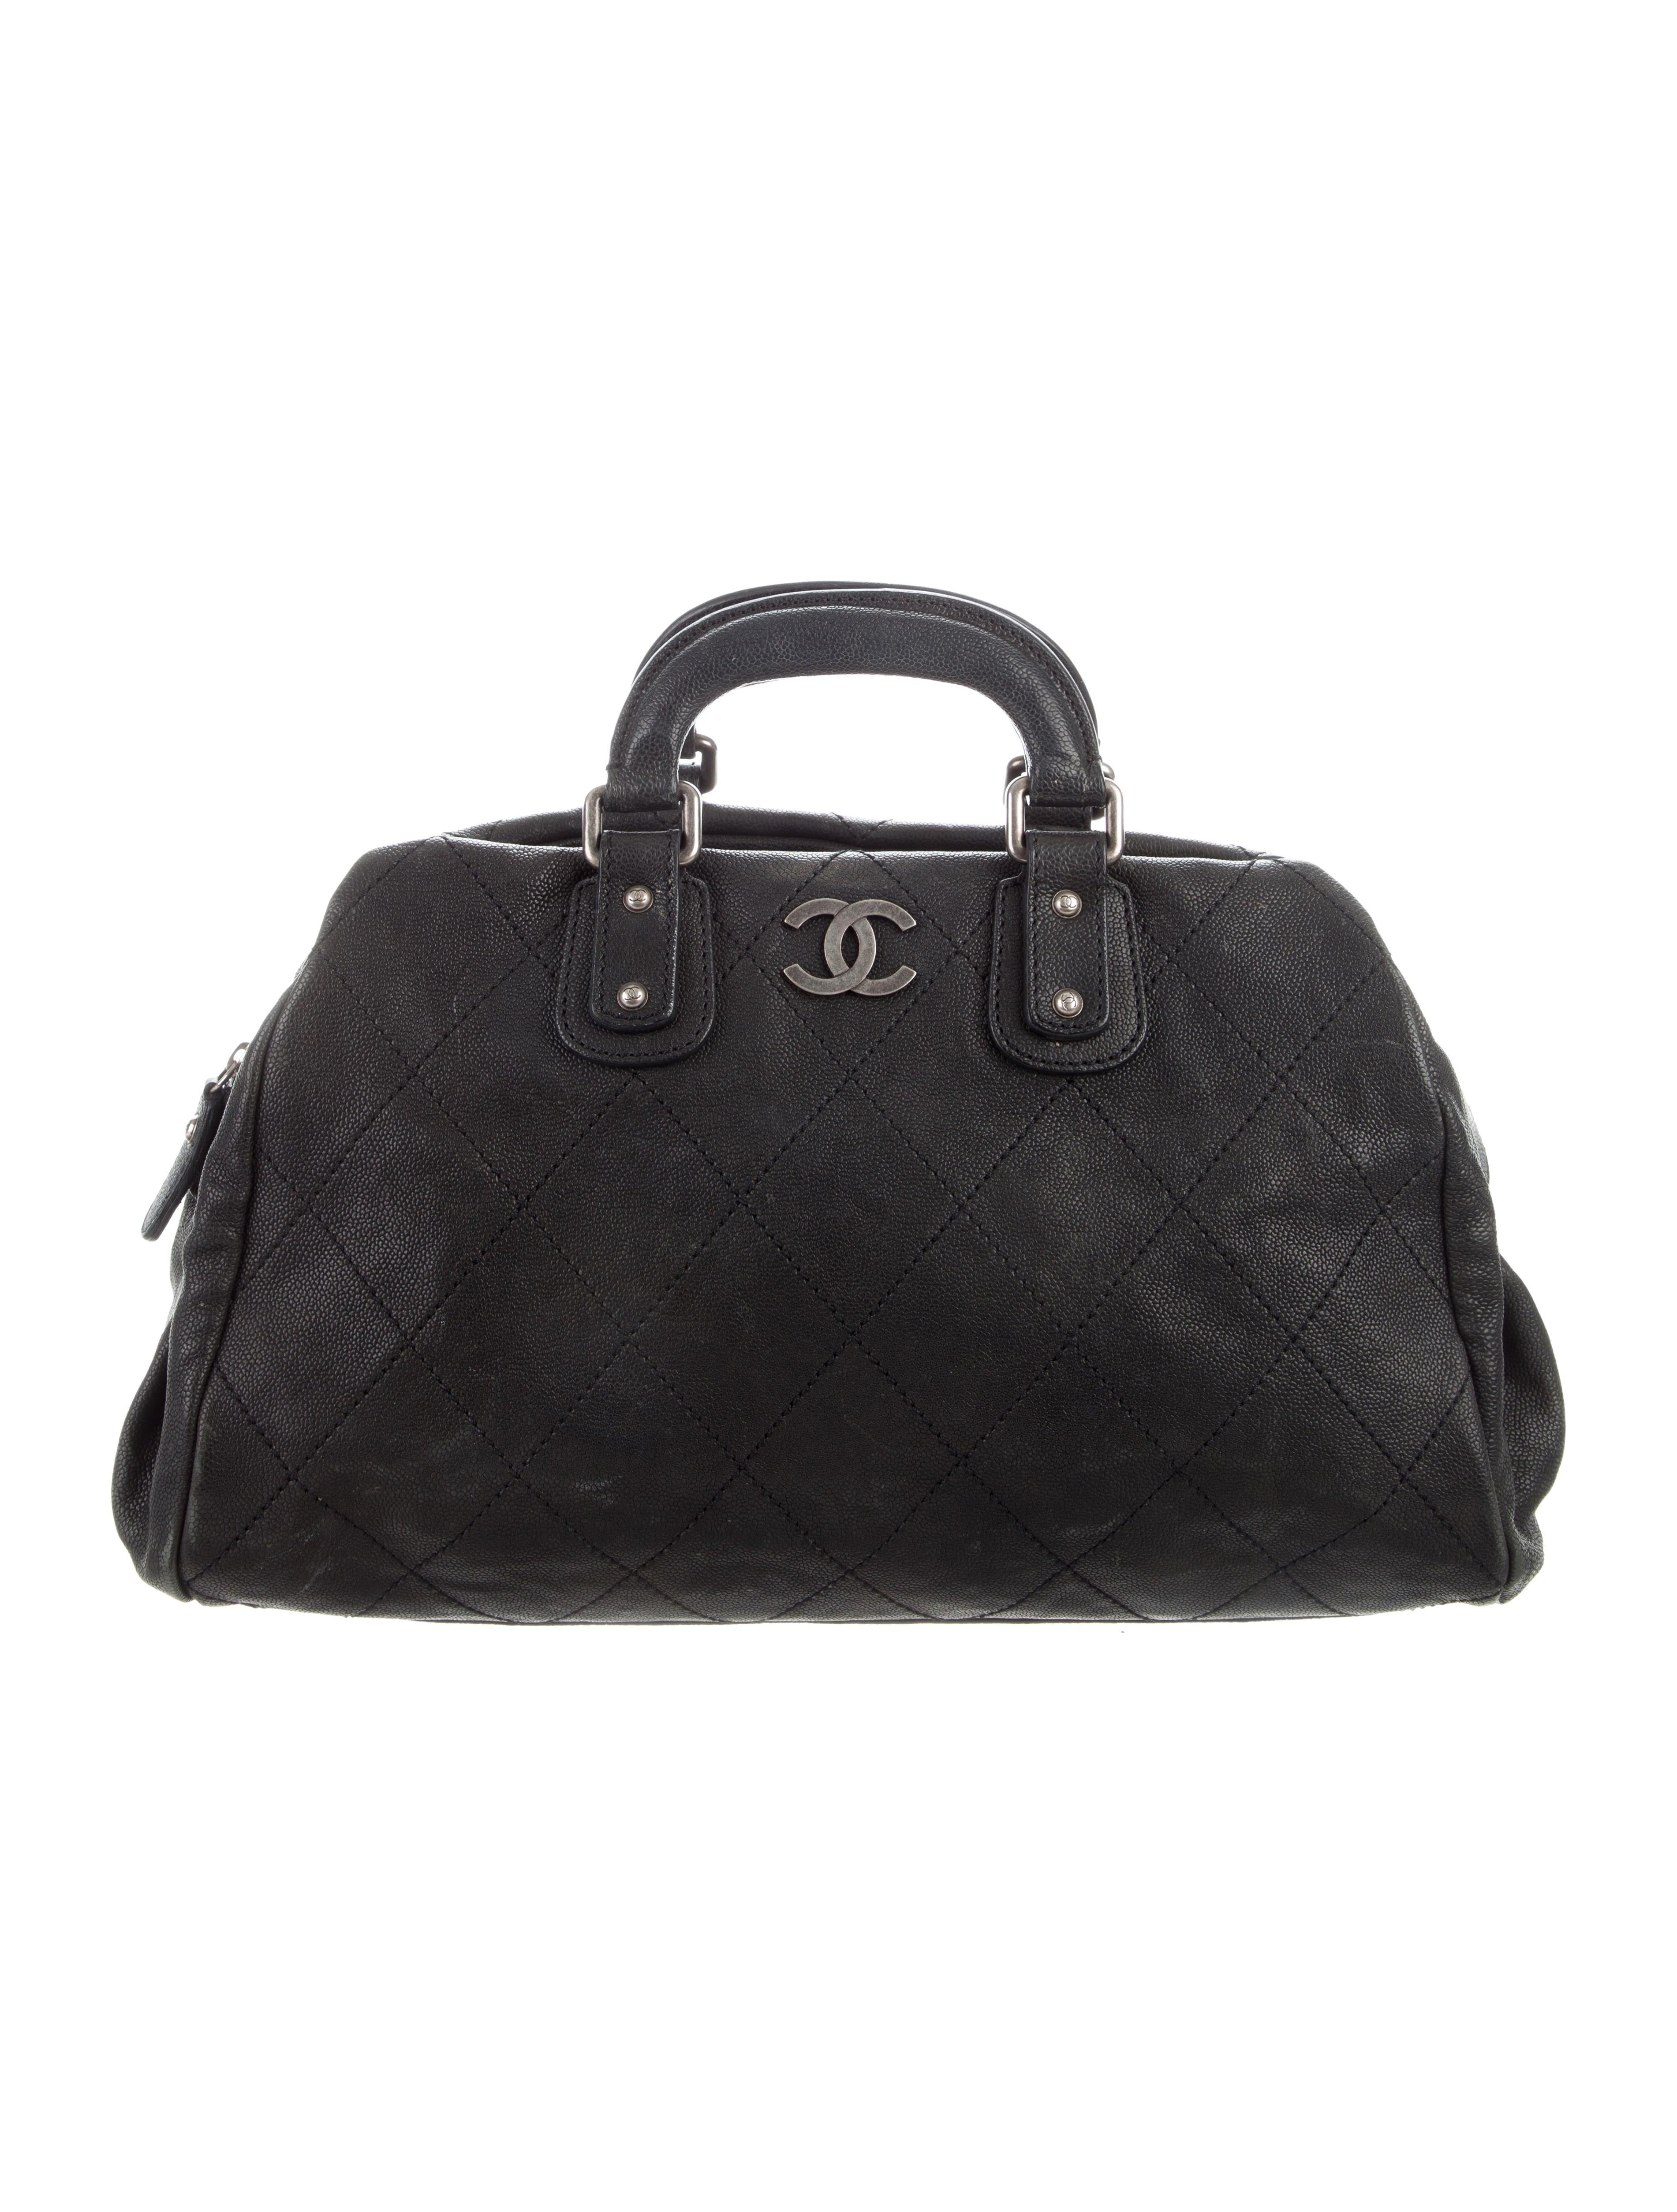 b1dcd7dff3 Chanel Handbags